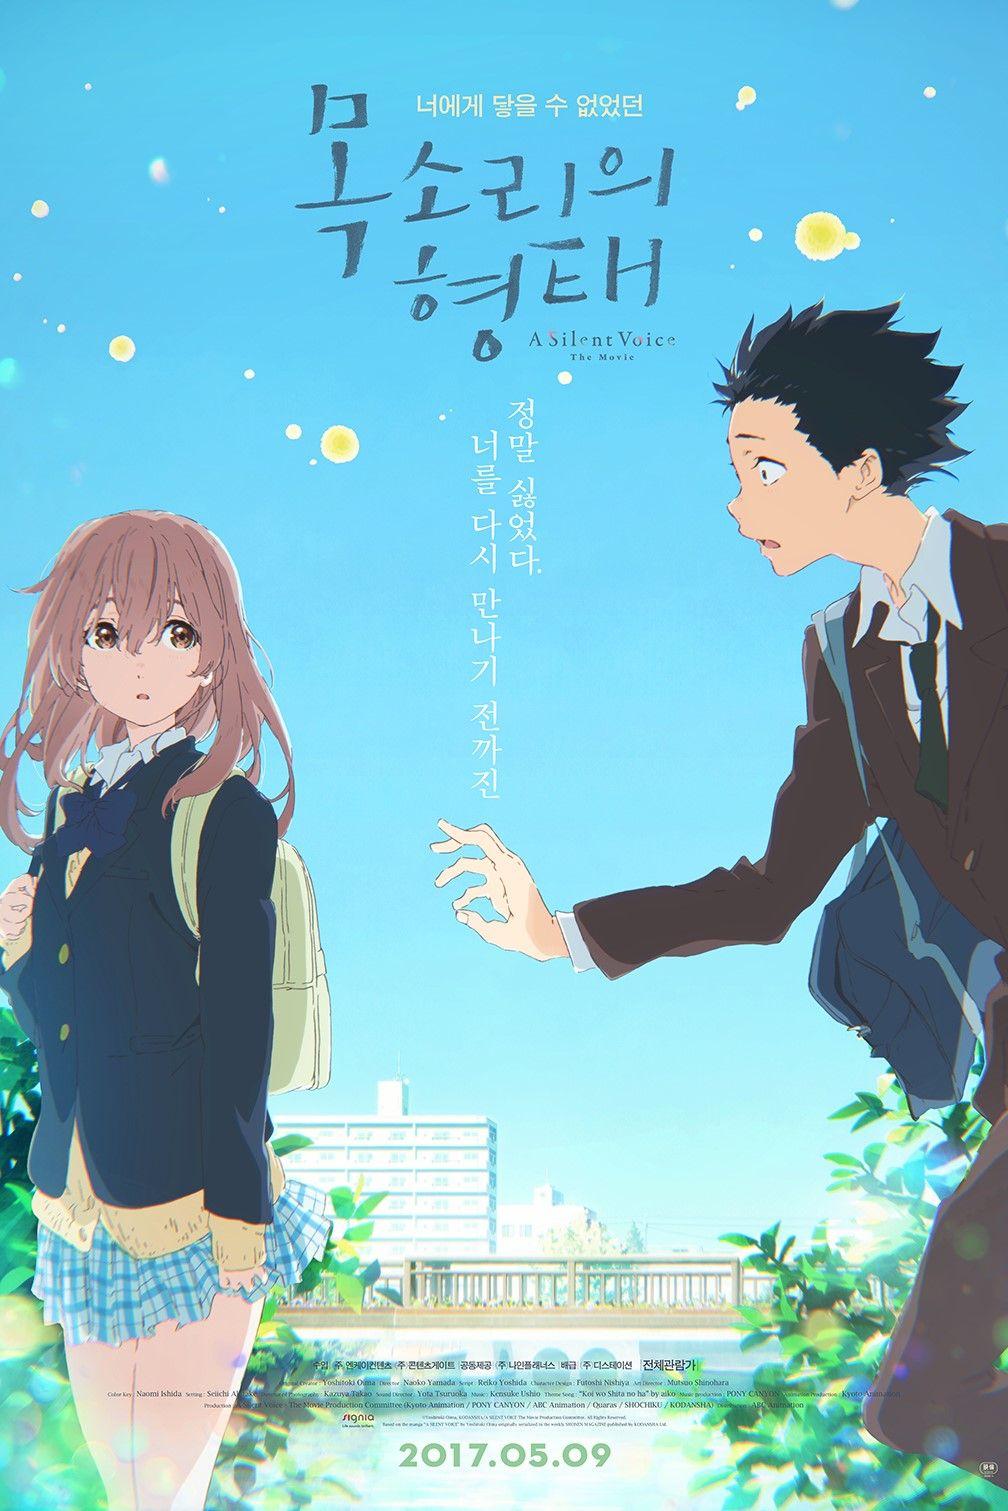 Pin oleh kyle koh di koe no katachi a silent voice anime anime films dan kyoto animation